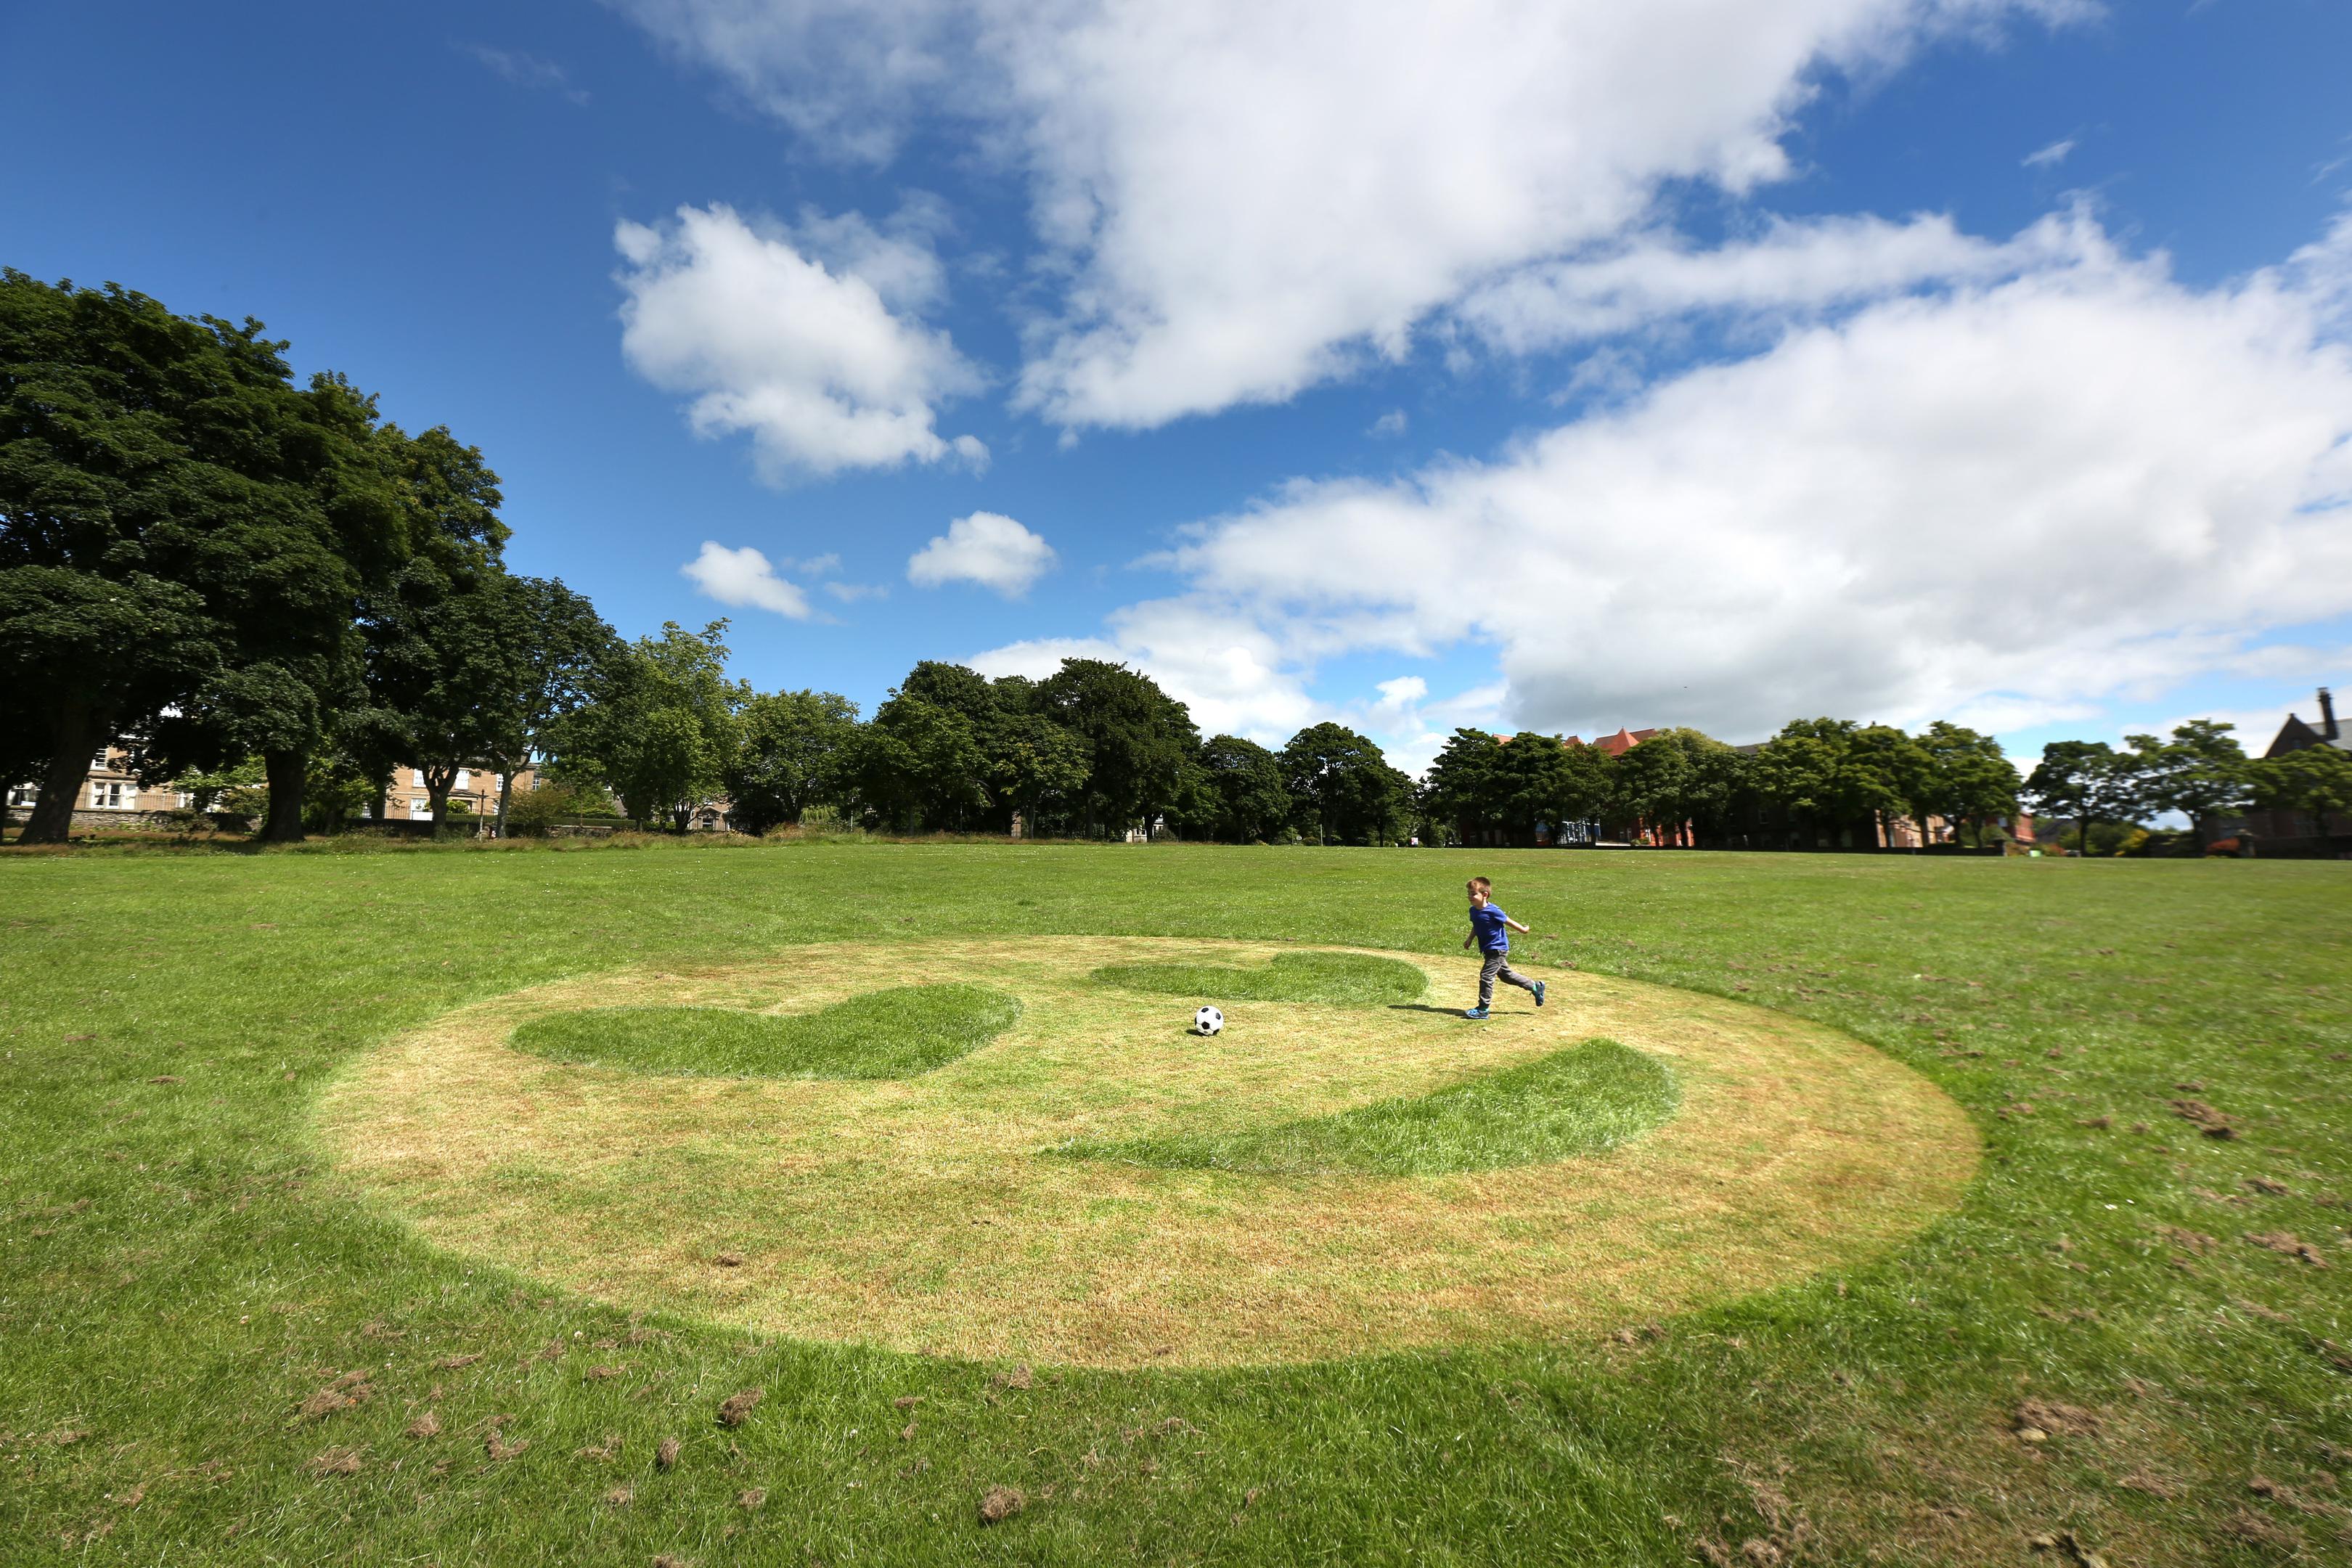 Murray Allan (4) playing football beside the emoji in Dudhope Park.